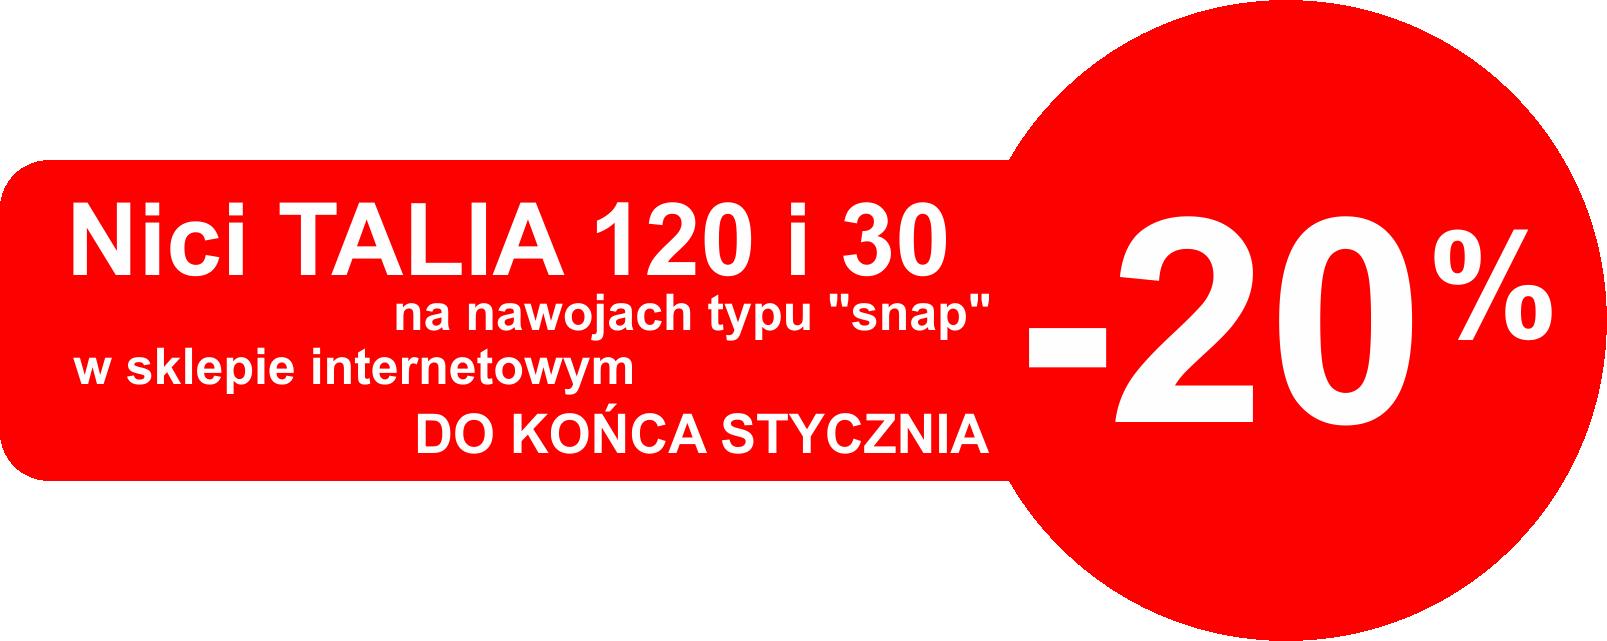 promocja_nowy sklep_01.2019